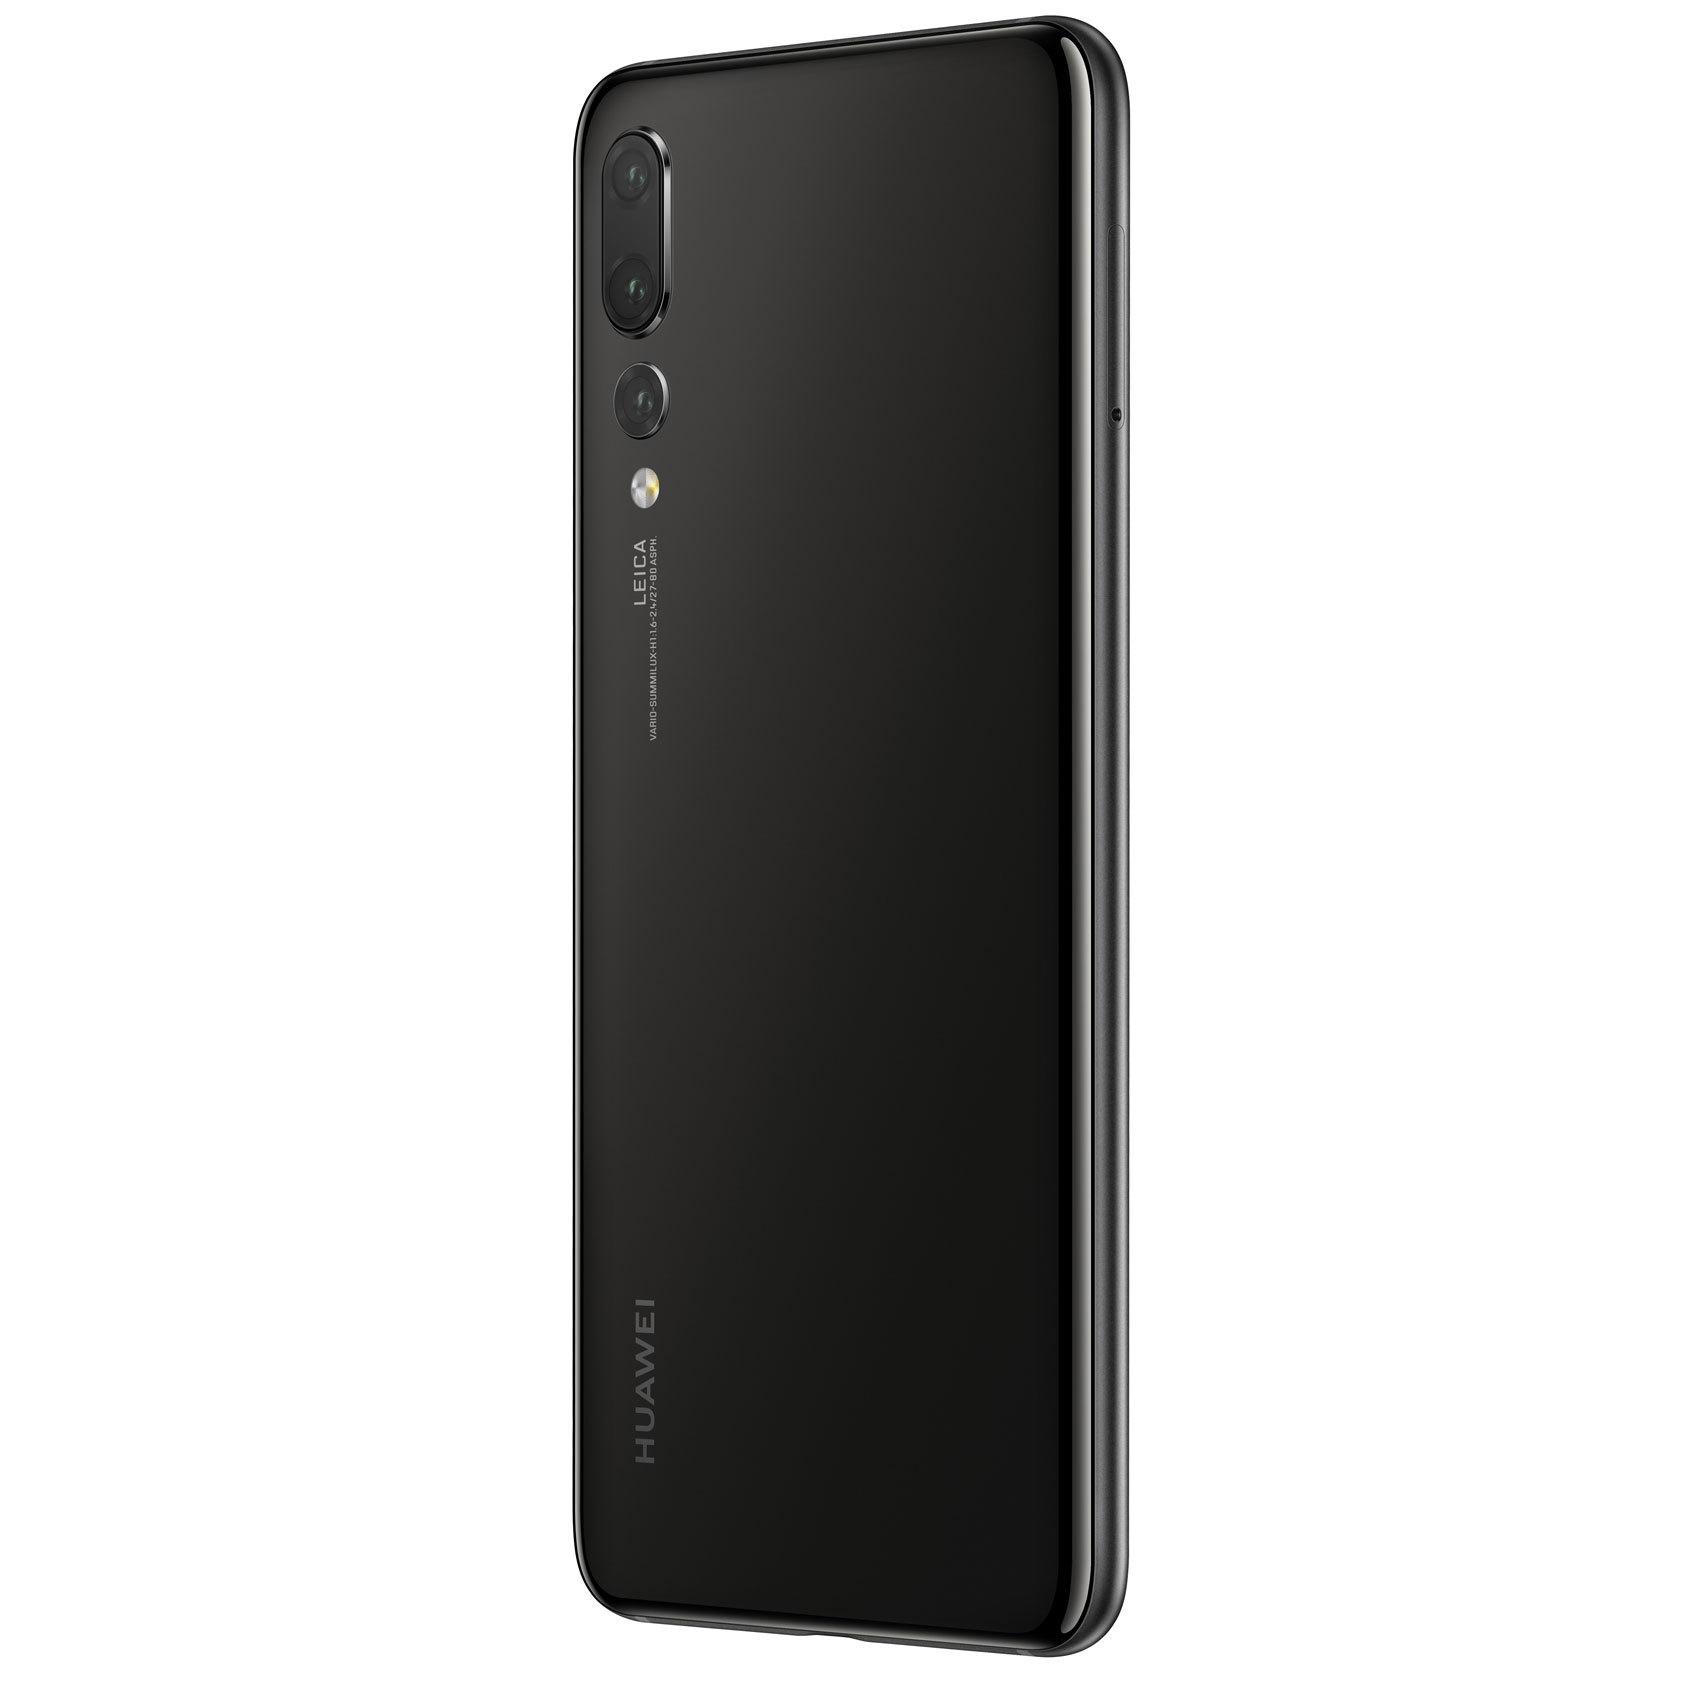 HUAWEI P20 PRO 128GB DS 4G BLACK